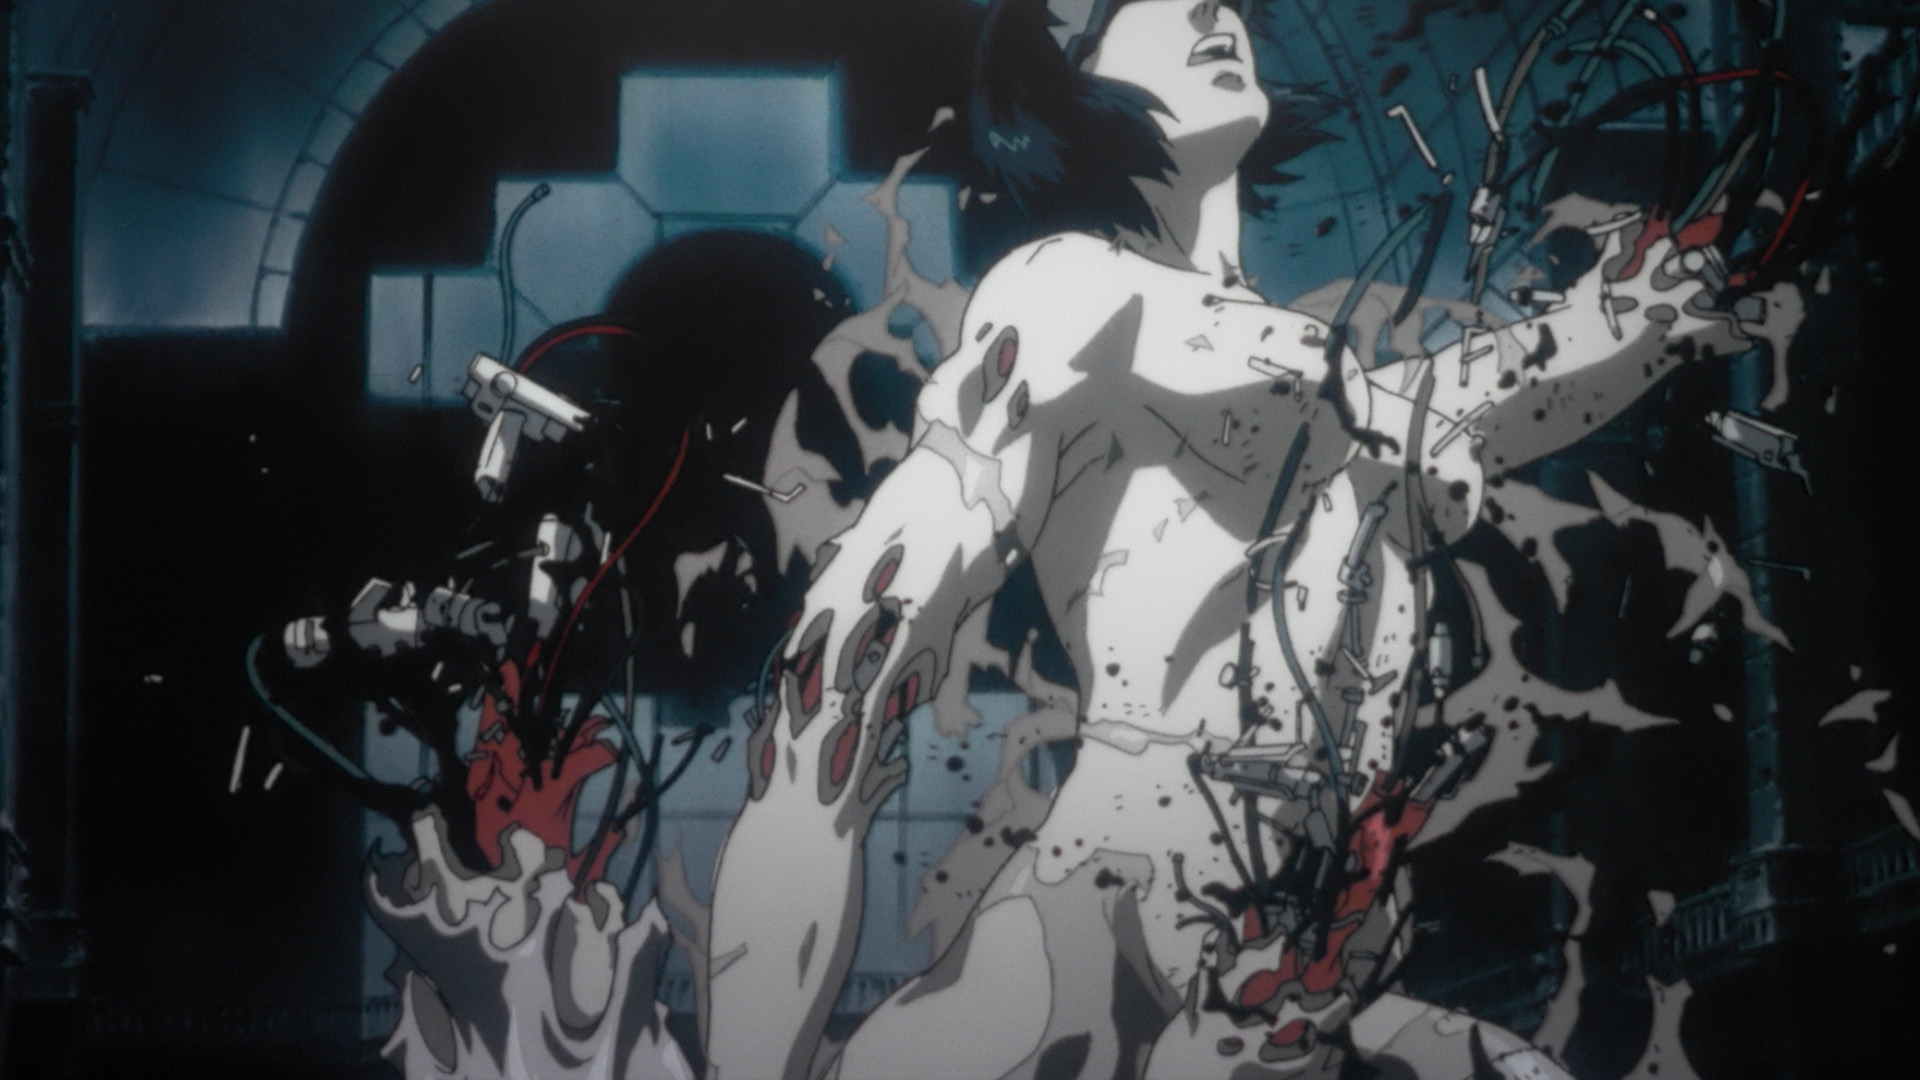 Ghost in the Shell de Mamoru Oshii